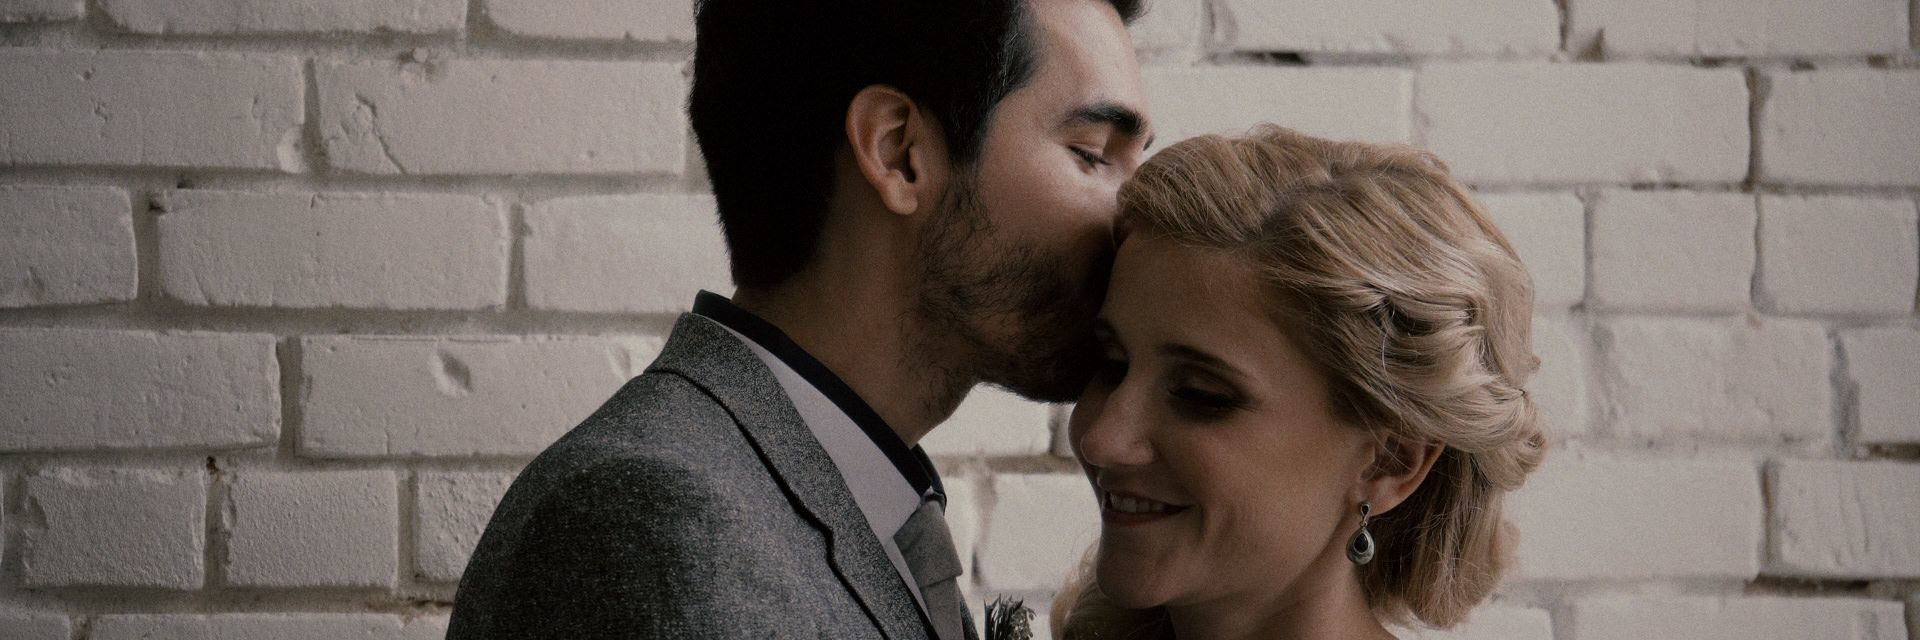 Lucca-wedding-videographer-cinemate-films-03